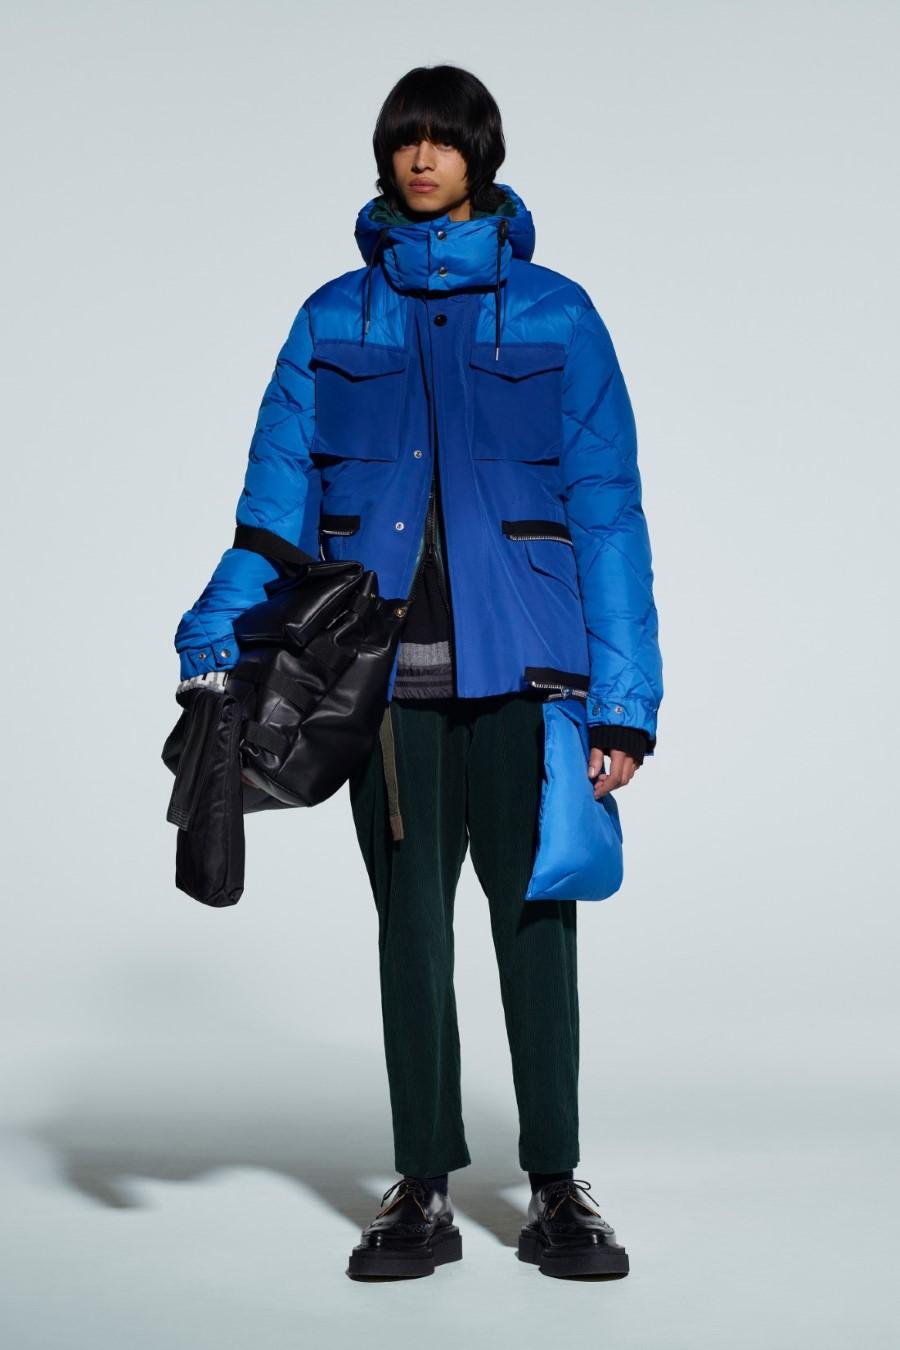 Sacai Men's Fall Winter 2021 - Tokyo Fashion Week